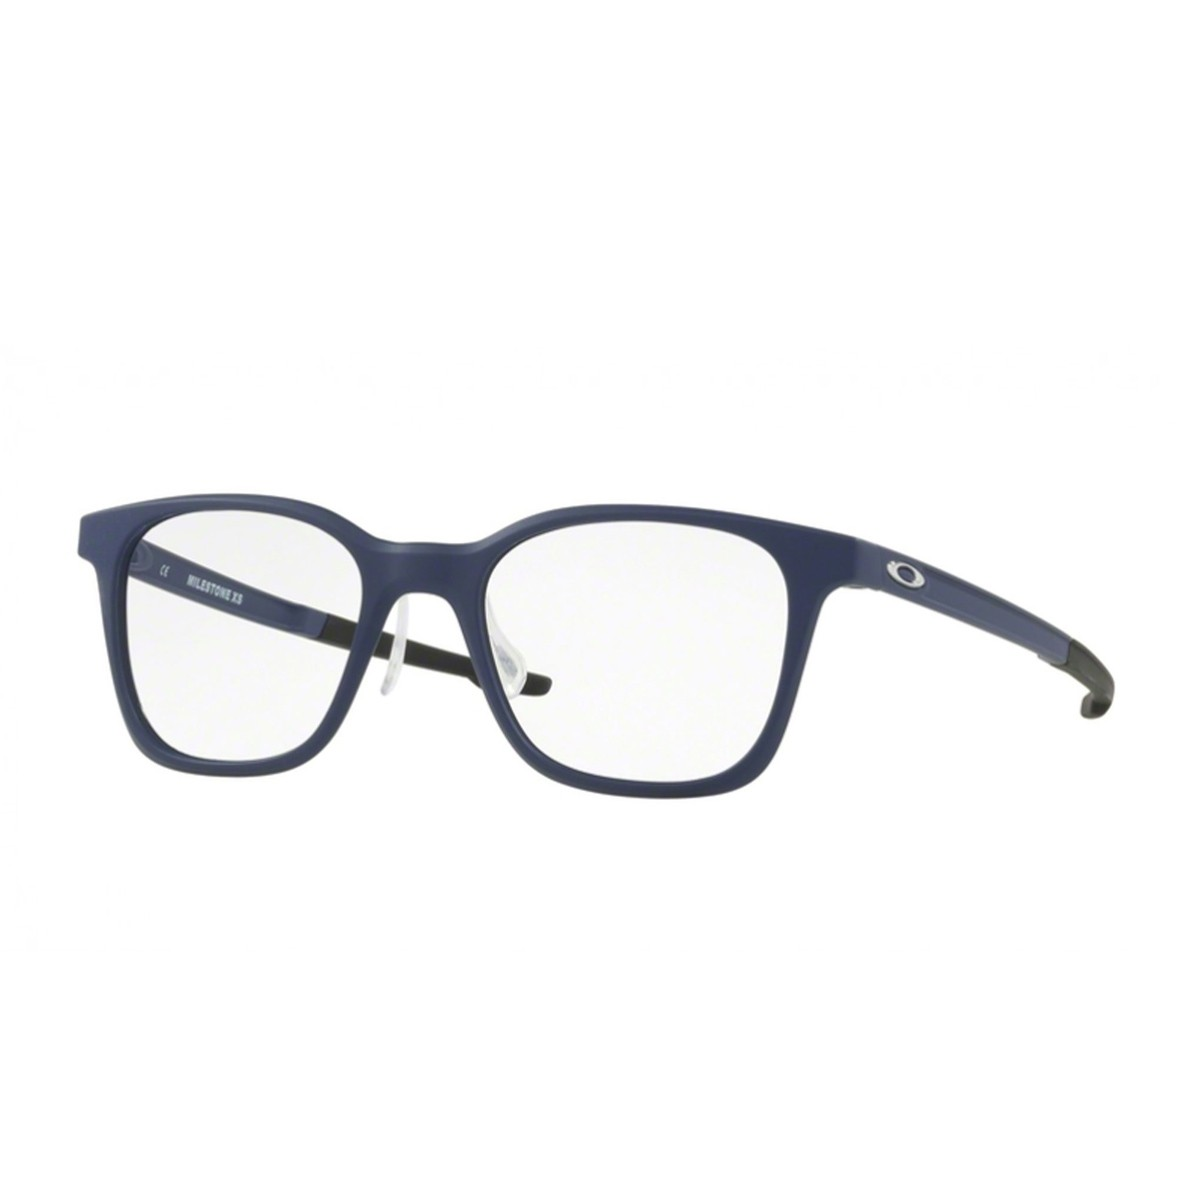 Oakley Youth Milestone XS OY8004 | Occhiali da vista Bambino